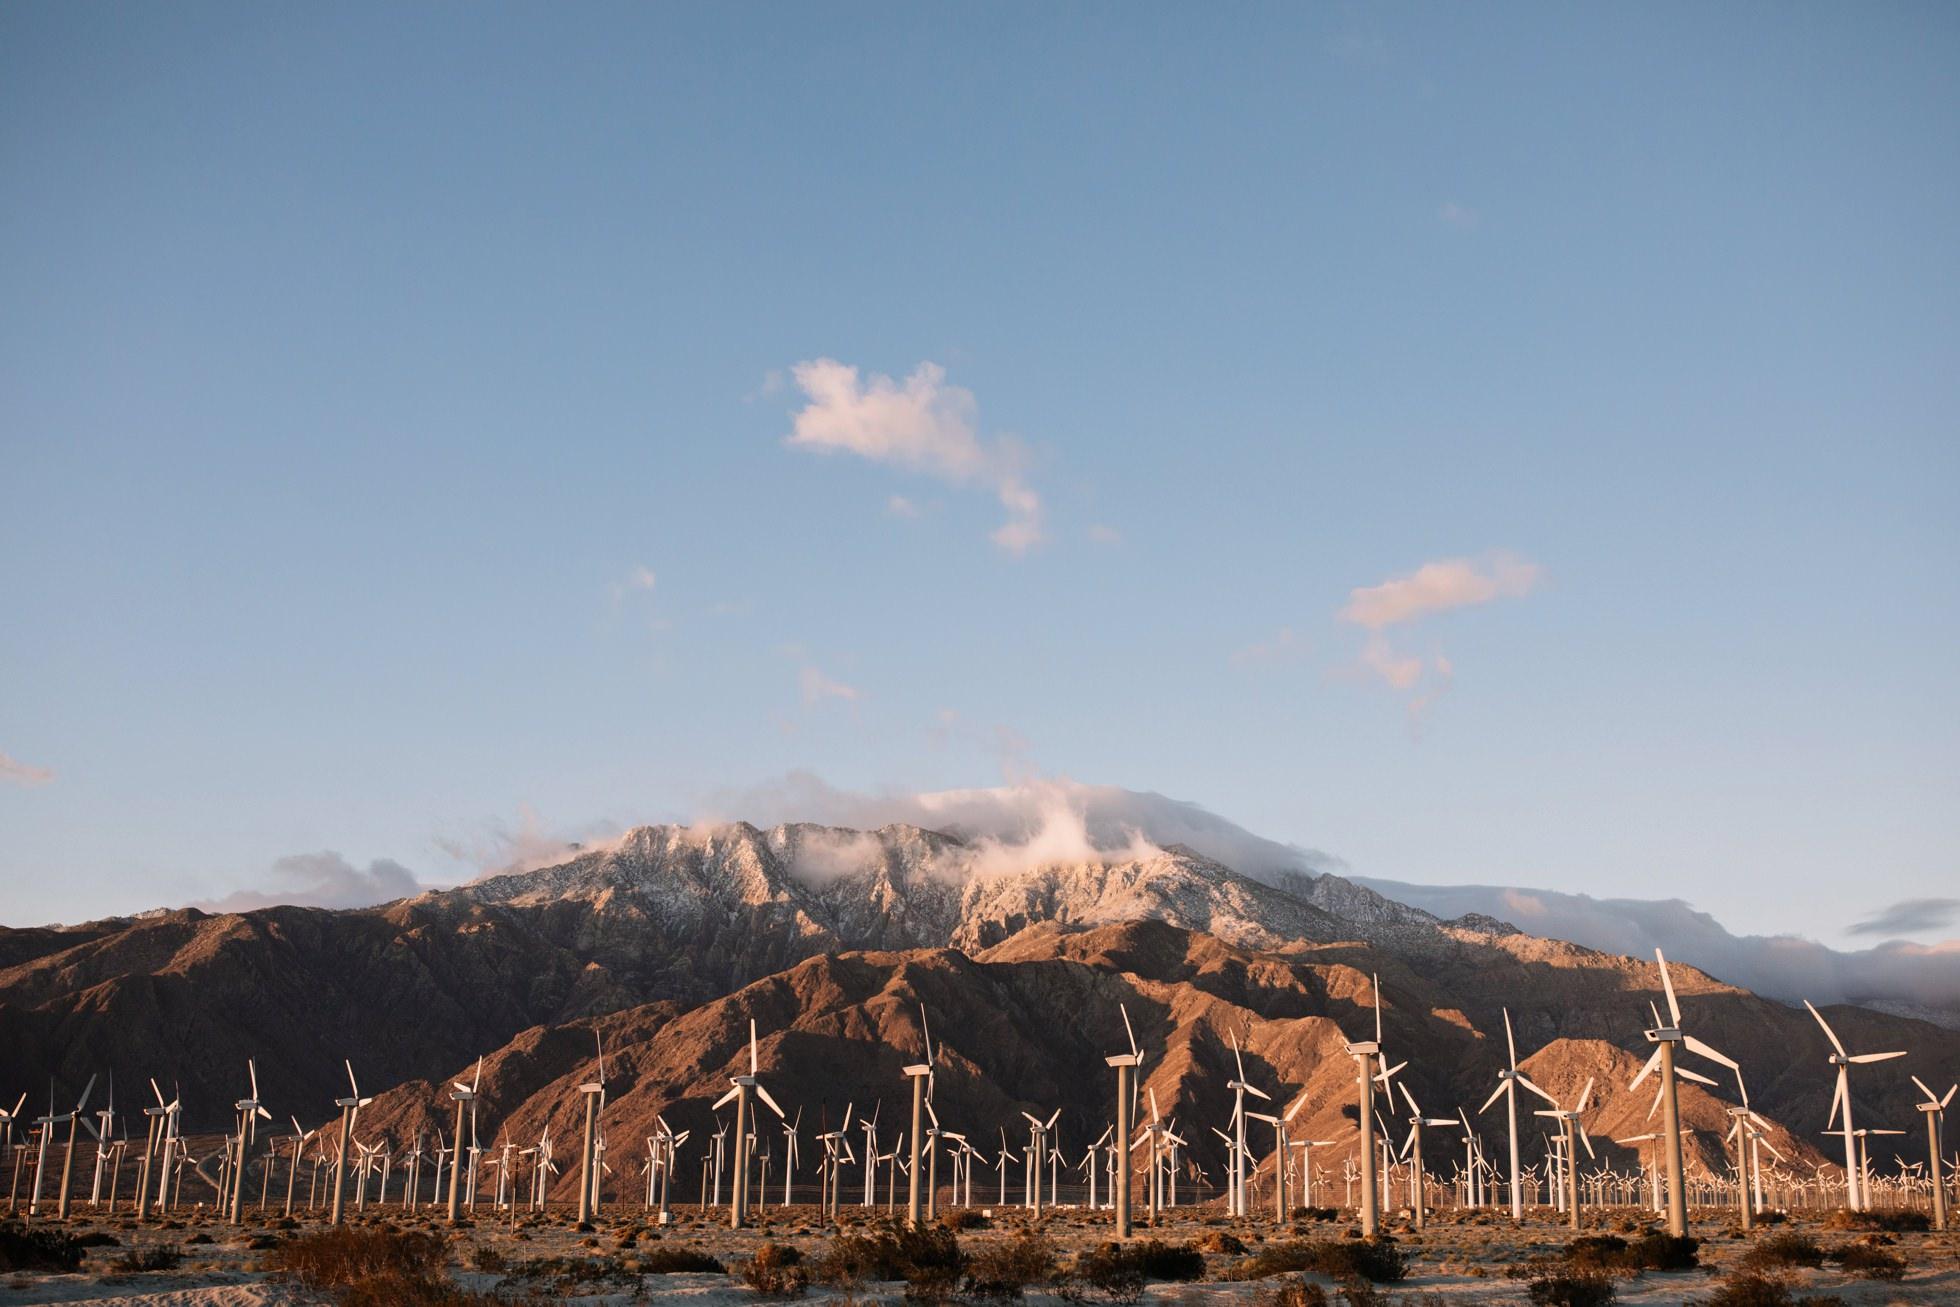 0044-palm-springs-wind-farm-sunrise-photography-mt-san-jacinto